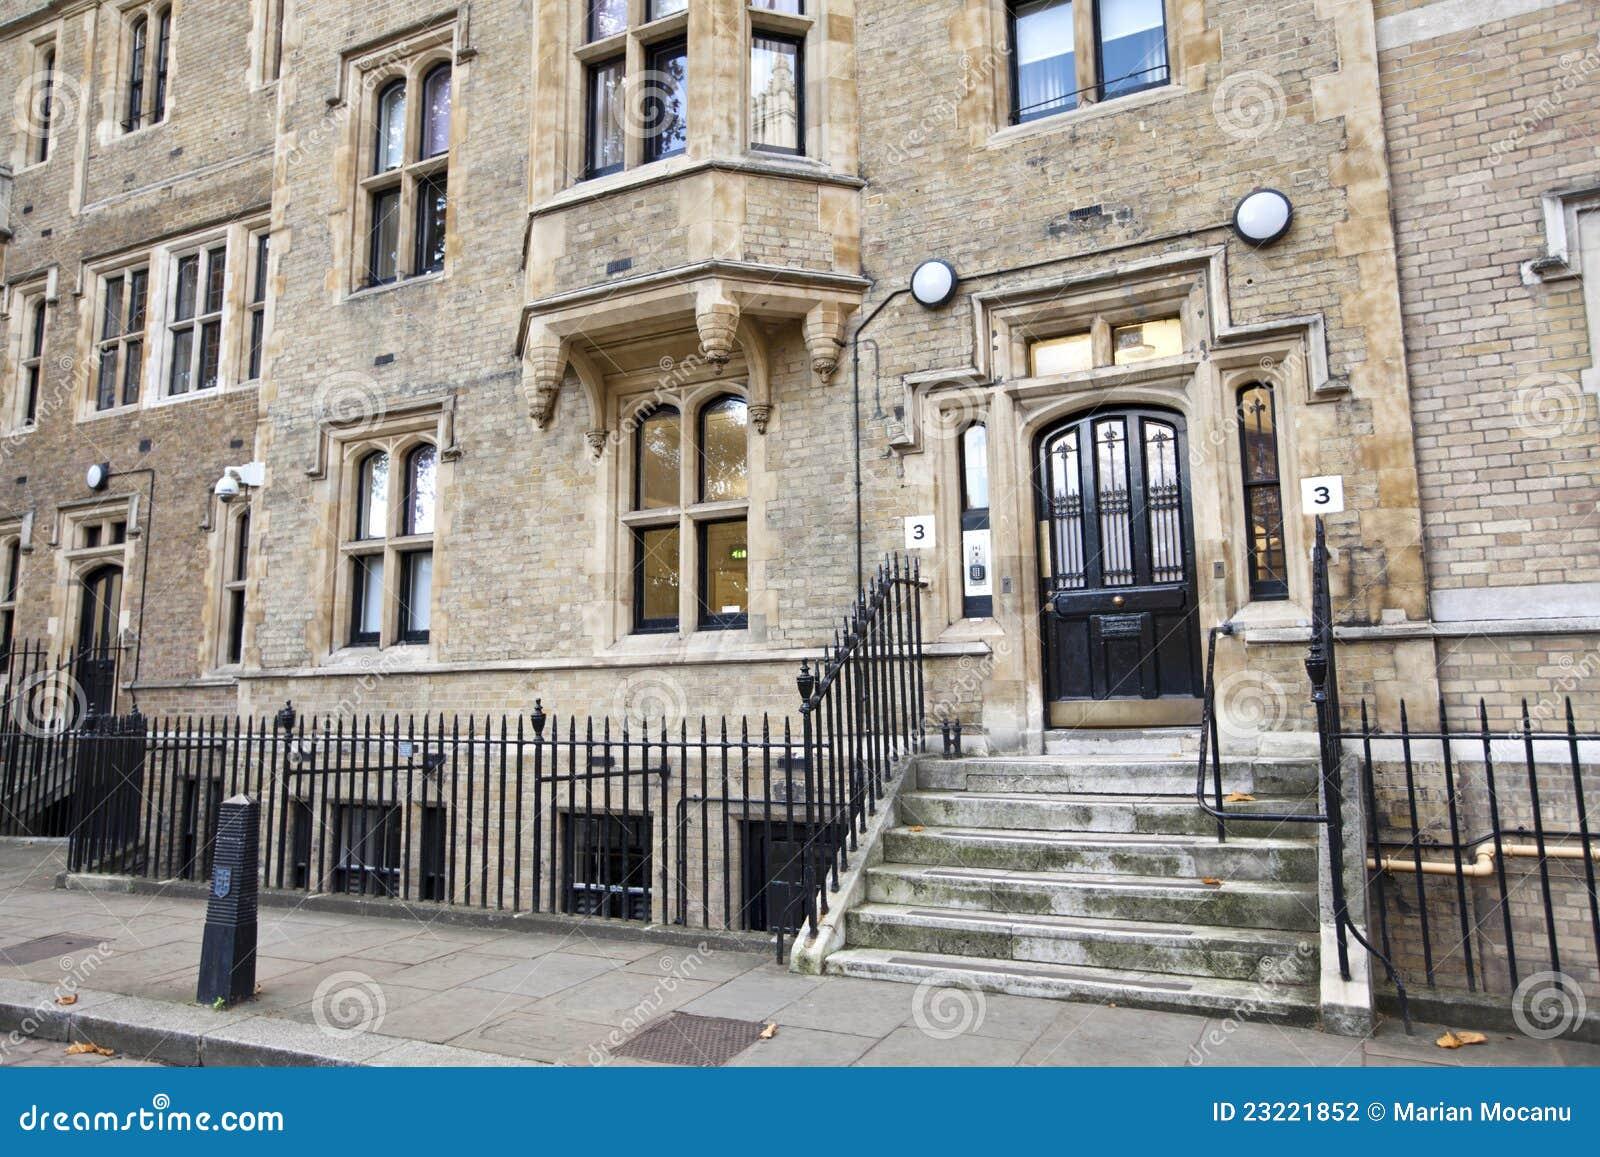 Alte architektur in london stockfotografie bild 23221852 - London architektur ...